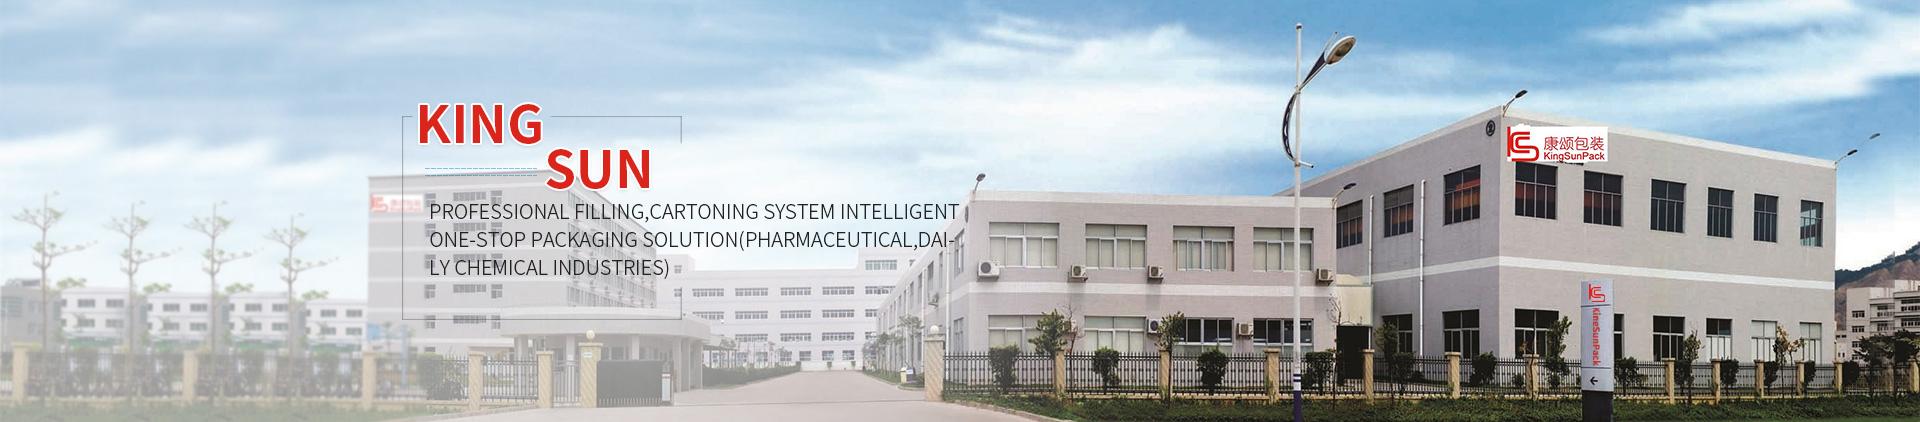 Shanghai Kang Sun Industrial Co., Ltd.